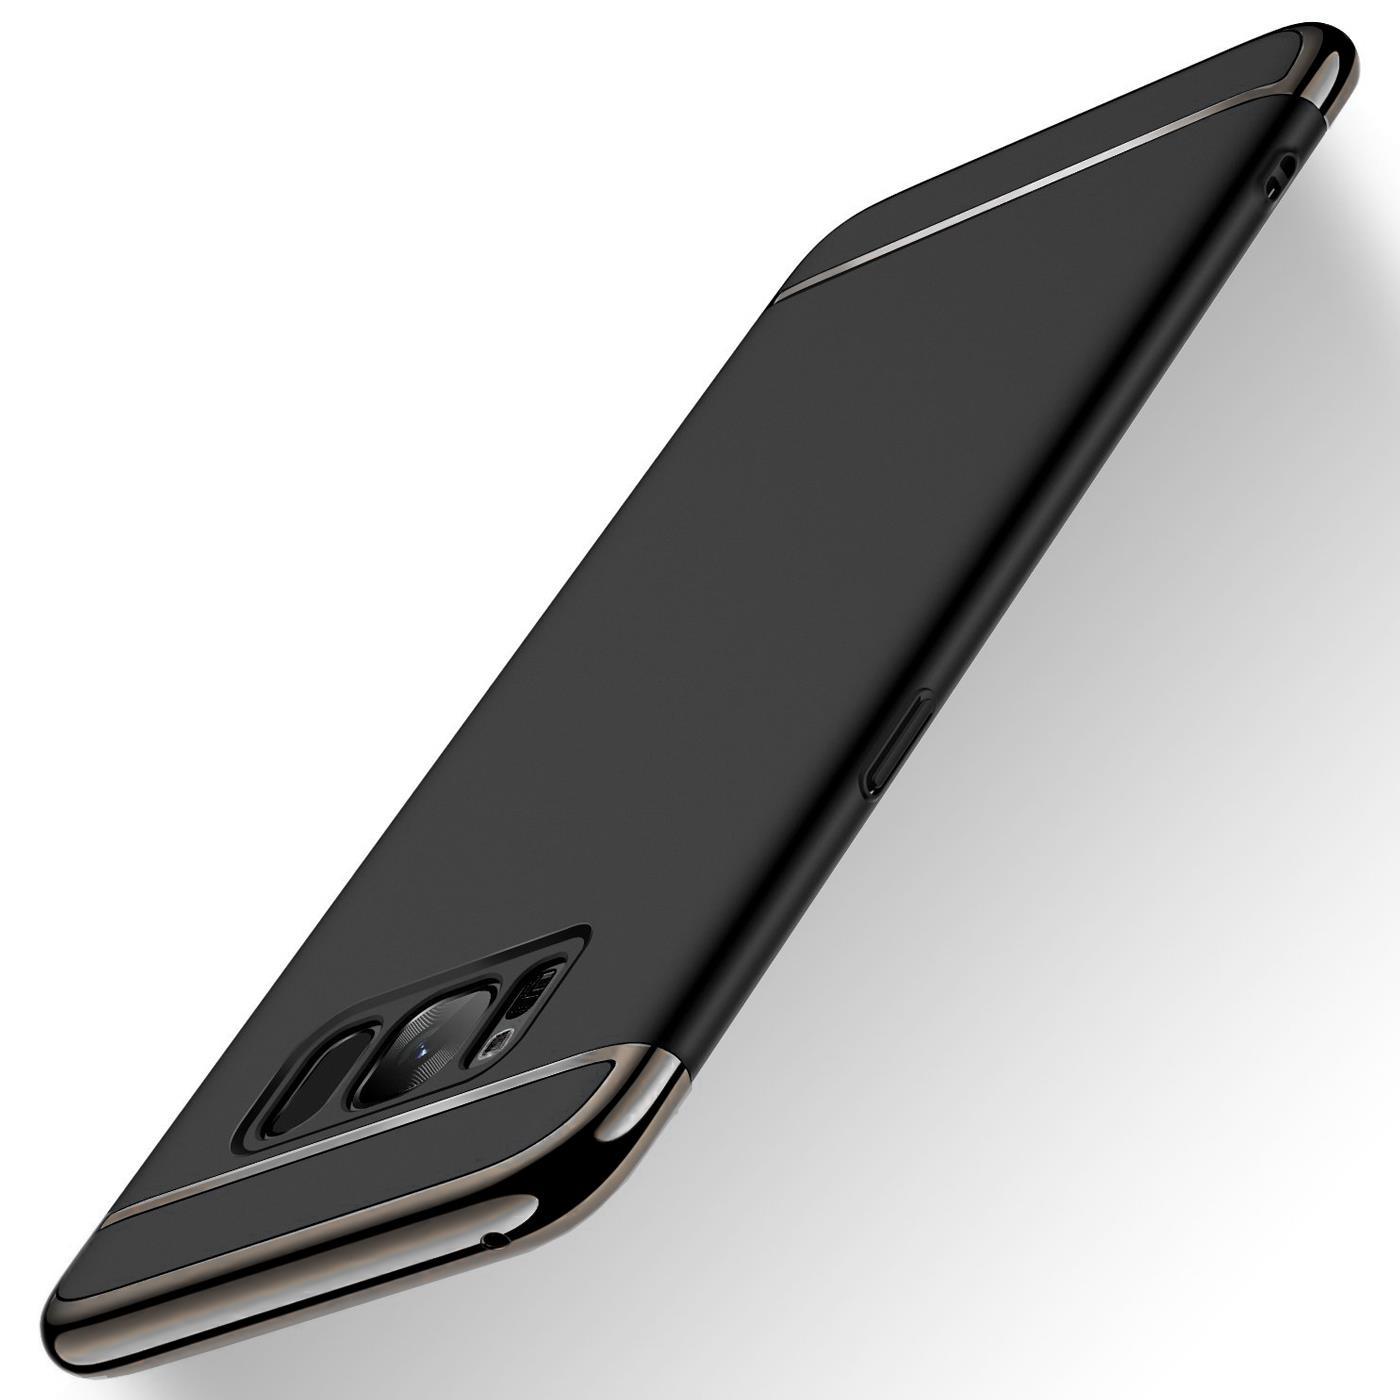 Samsung-Galaxy-S8-Hard-Back-Case-Cover-Thin-Bumper-Slim-Shockproof-Rugged-Thin thumbnail 12